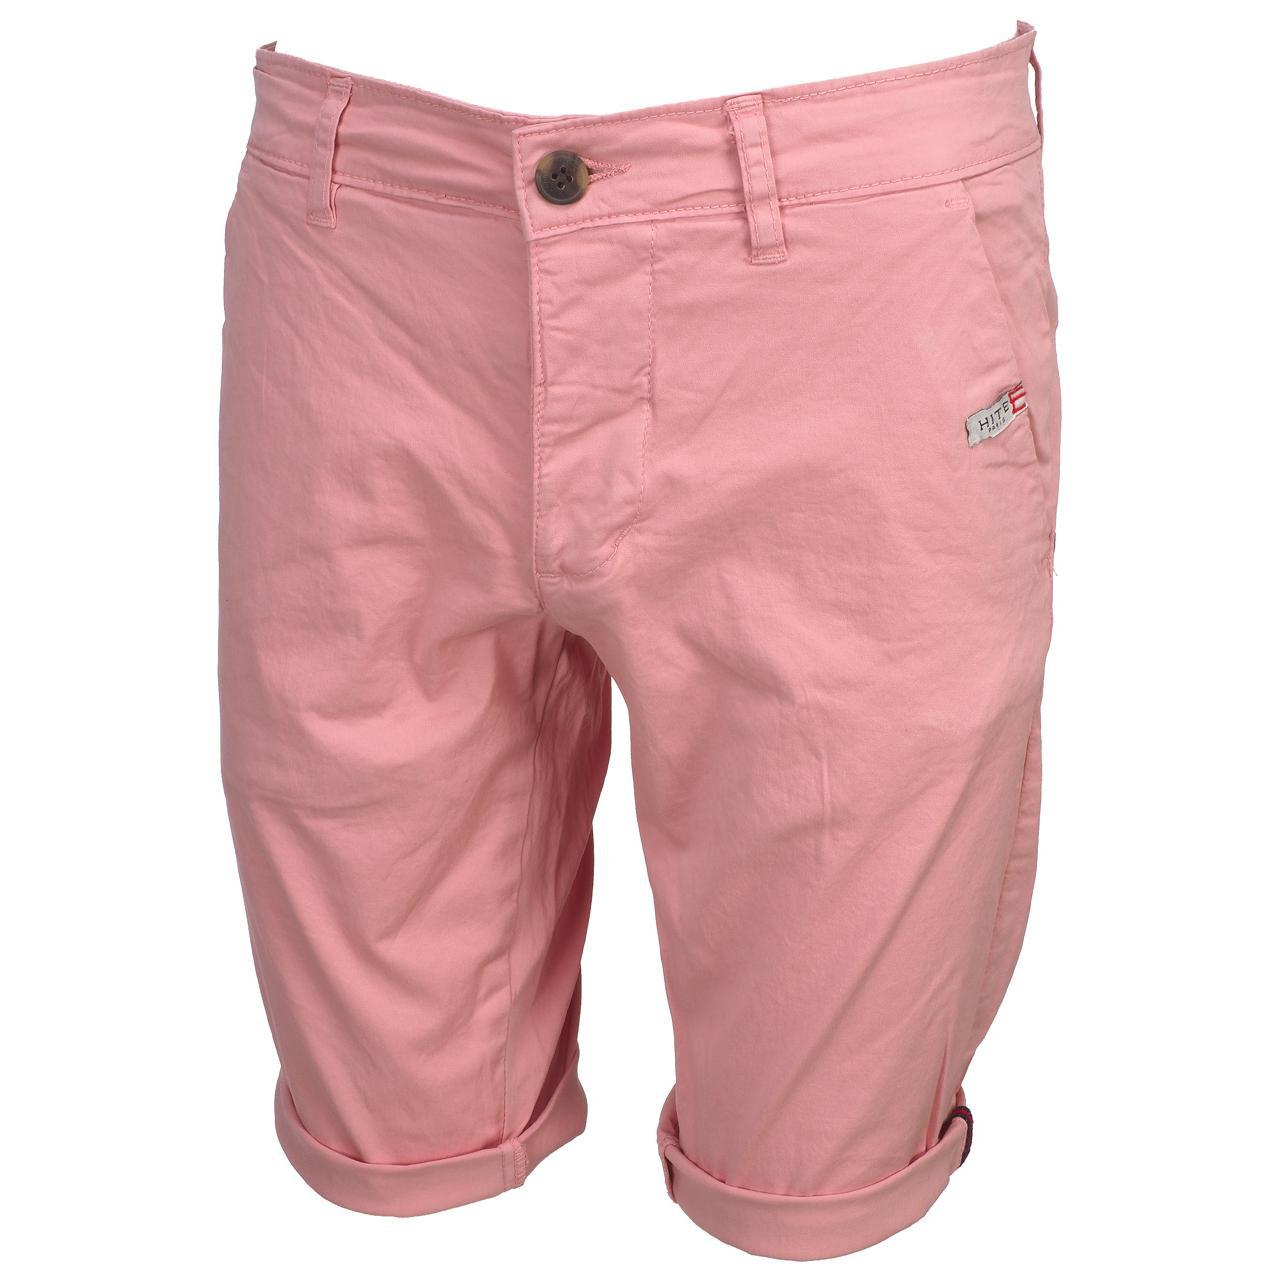 Bermuda-Shorts-Hite-Couture-Vobier-Rse-Bermuda-Chino-Pink-11606-New